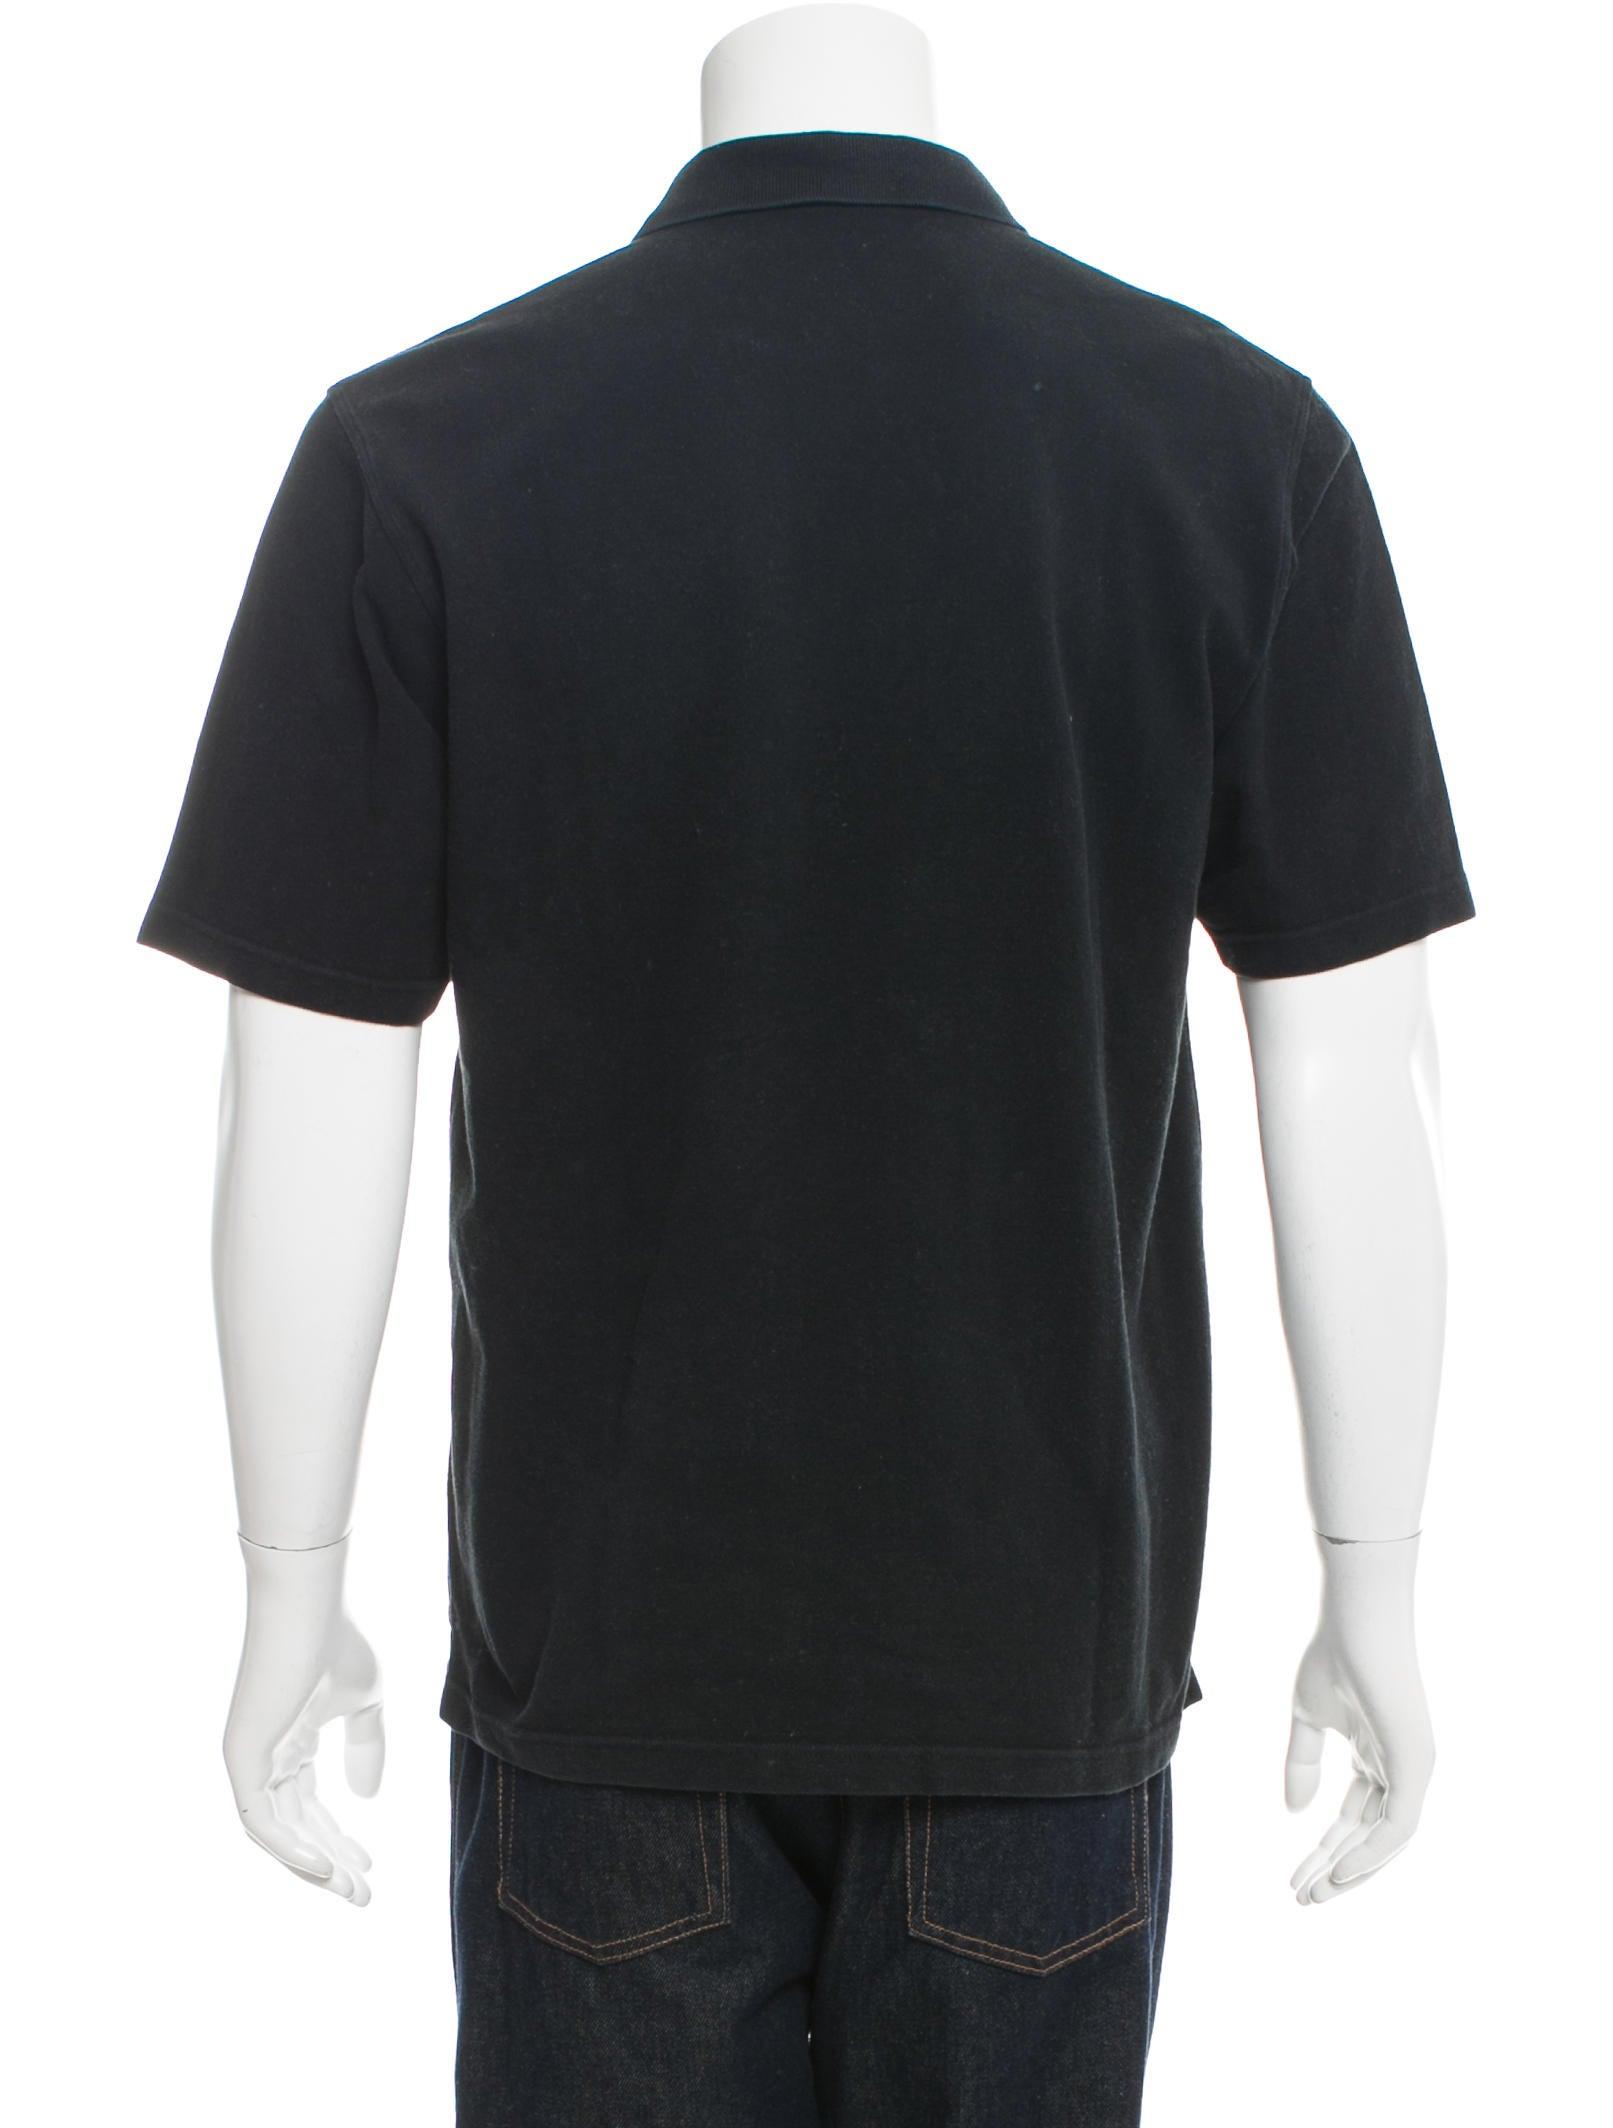 Burberry London Nova Check Trimmed Polo Shirt Clothing